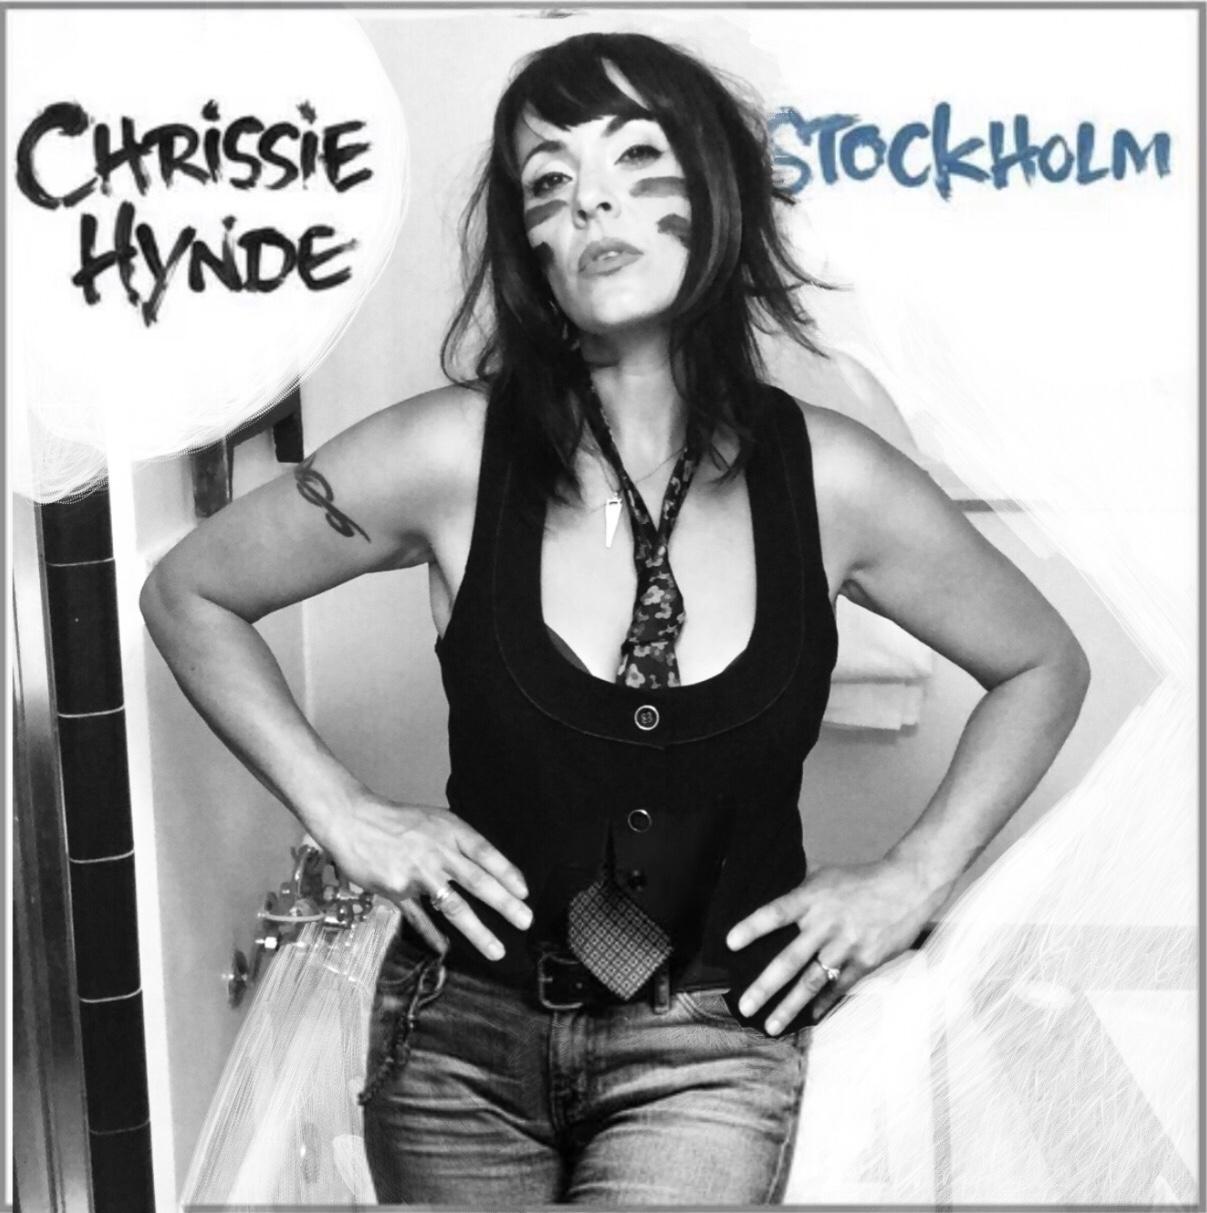 Chrissie Hyde Stockholm